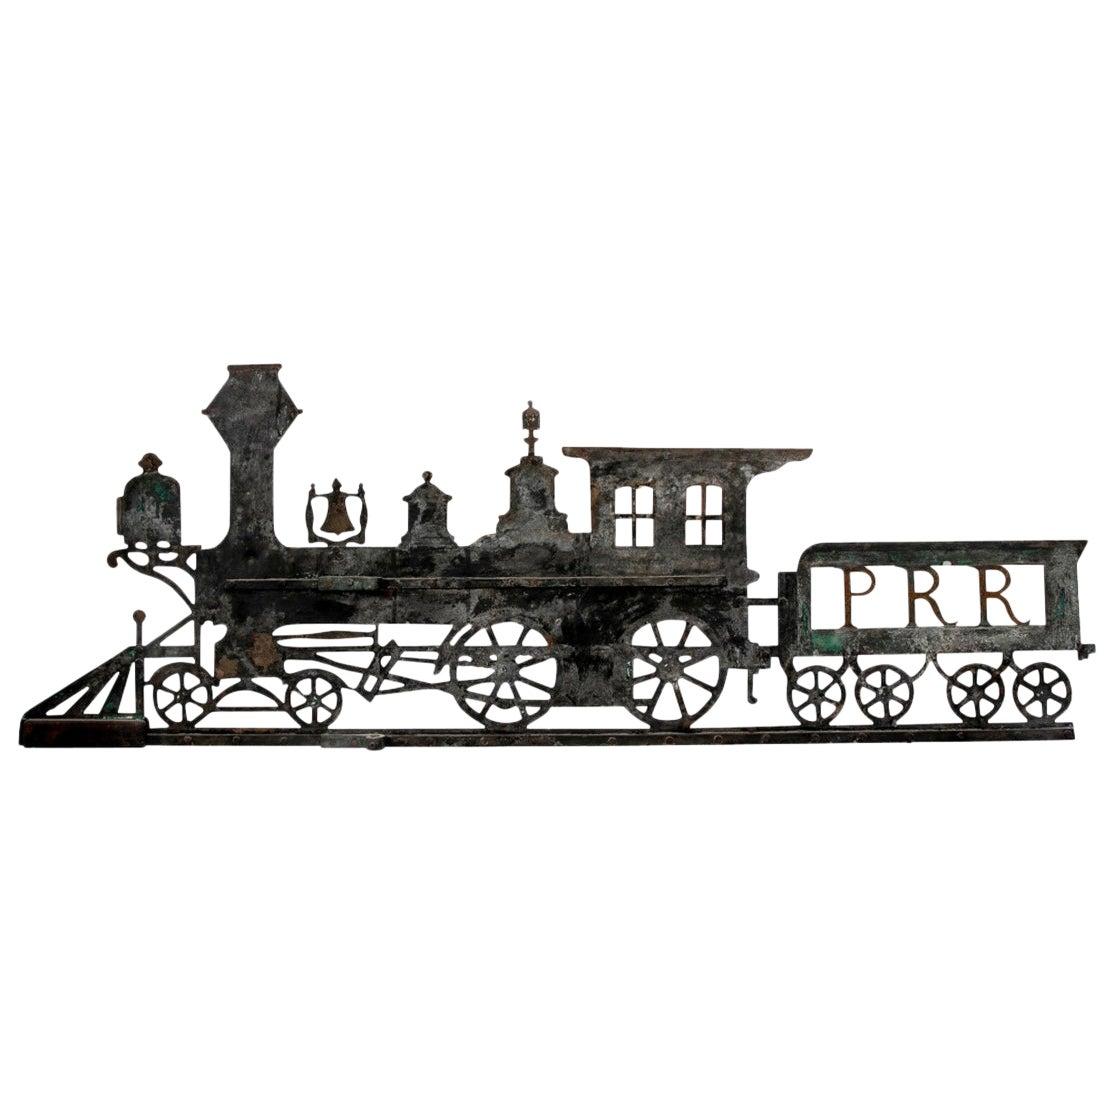 Antique Pennsylvania Folk Art Painted Iron Railroad Sign